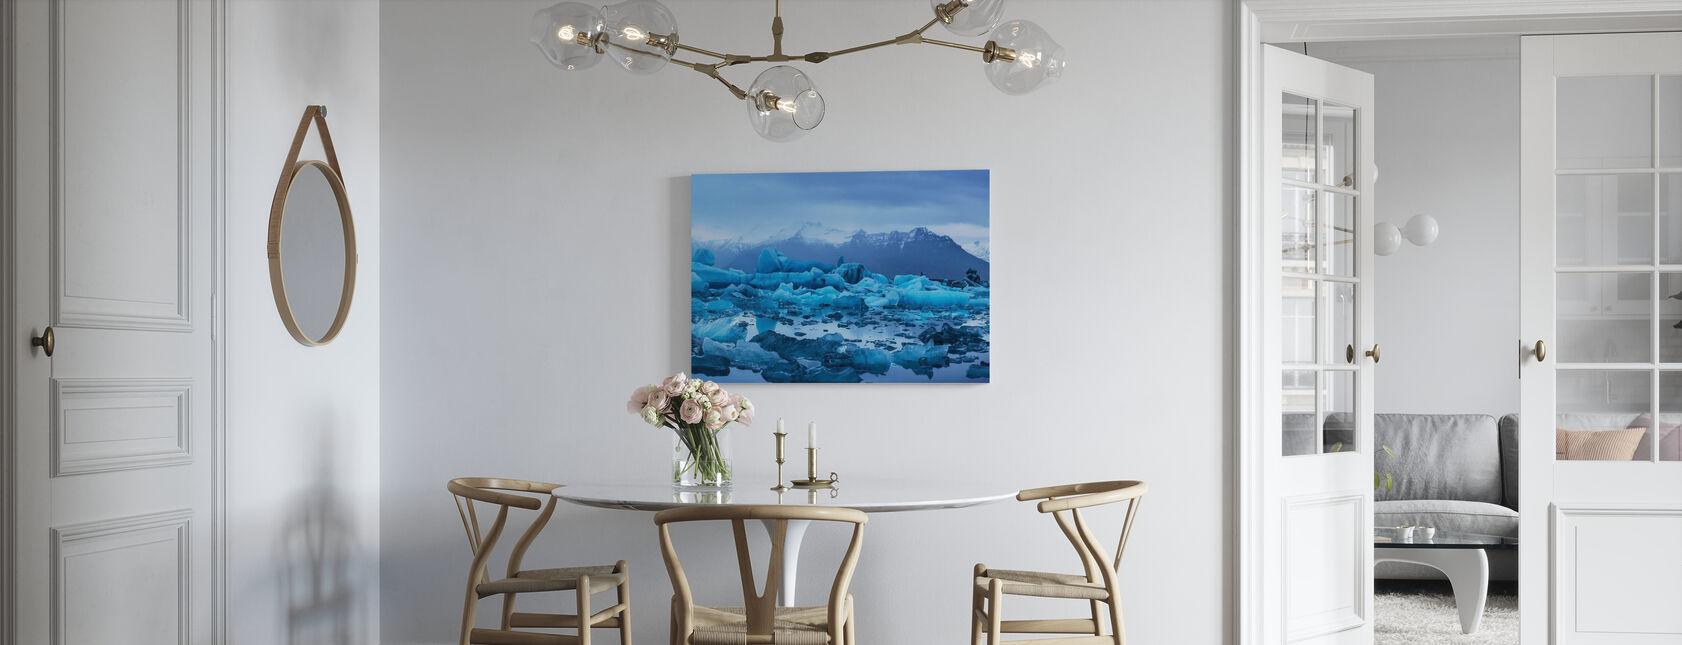 Licht Islands - Leinwandbild - Küchen